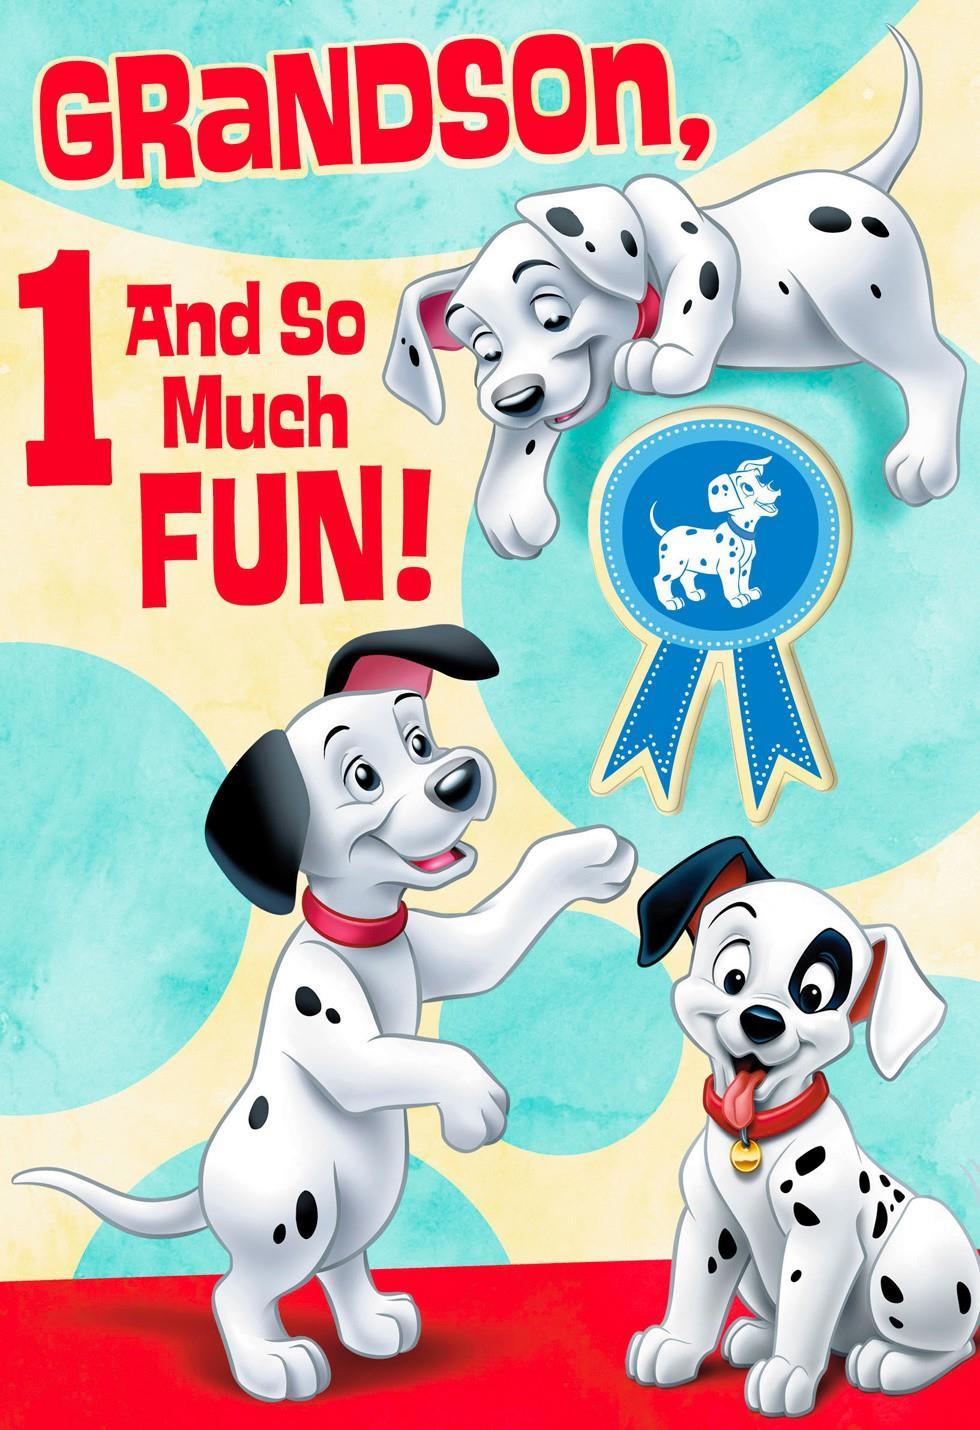 101 Dalmatians 1st Birthday Card For Grandson Greeting